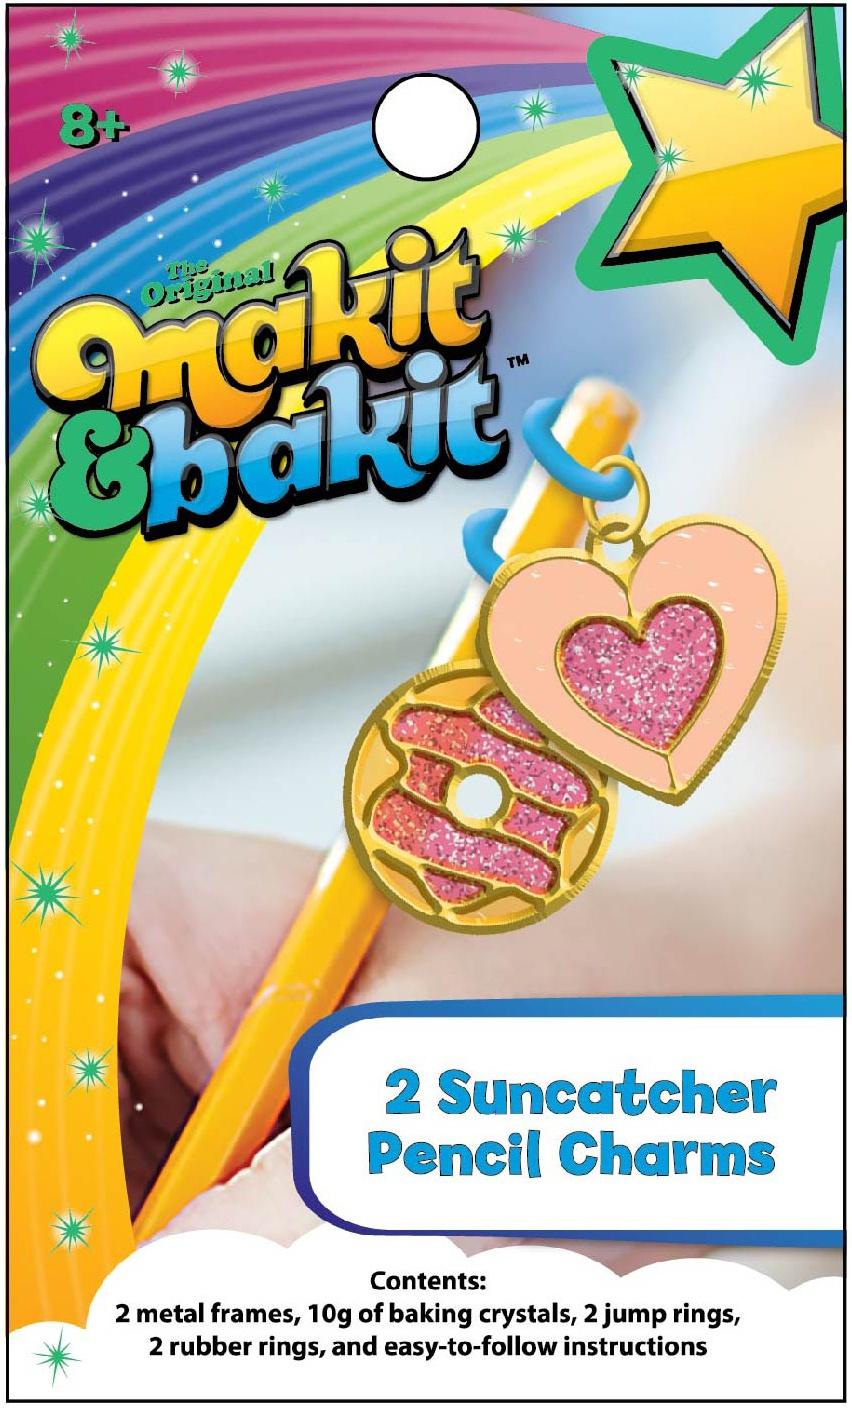 Makit & Bakit Suncatcher Kit-Pencil Charms 2/Pkg